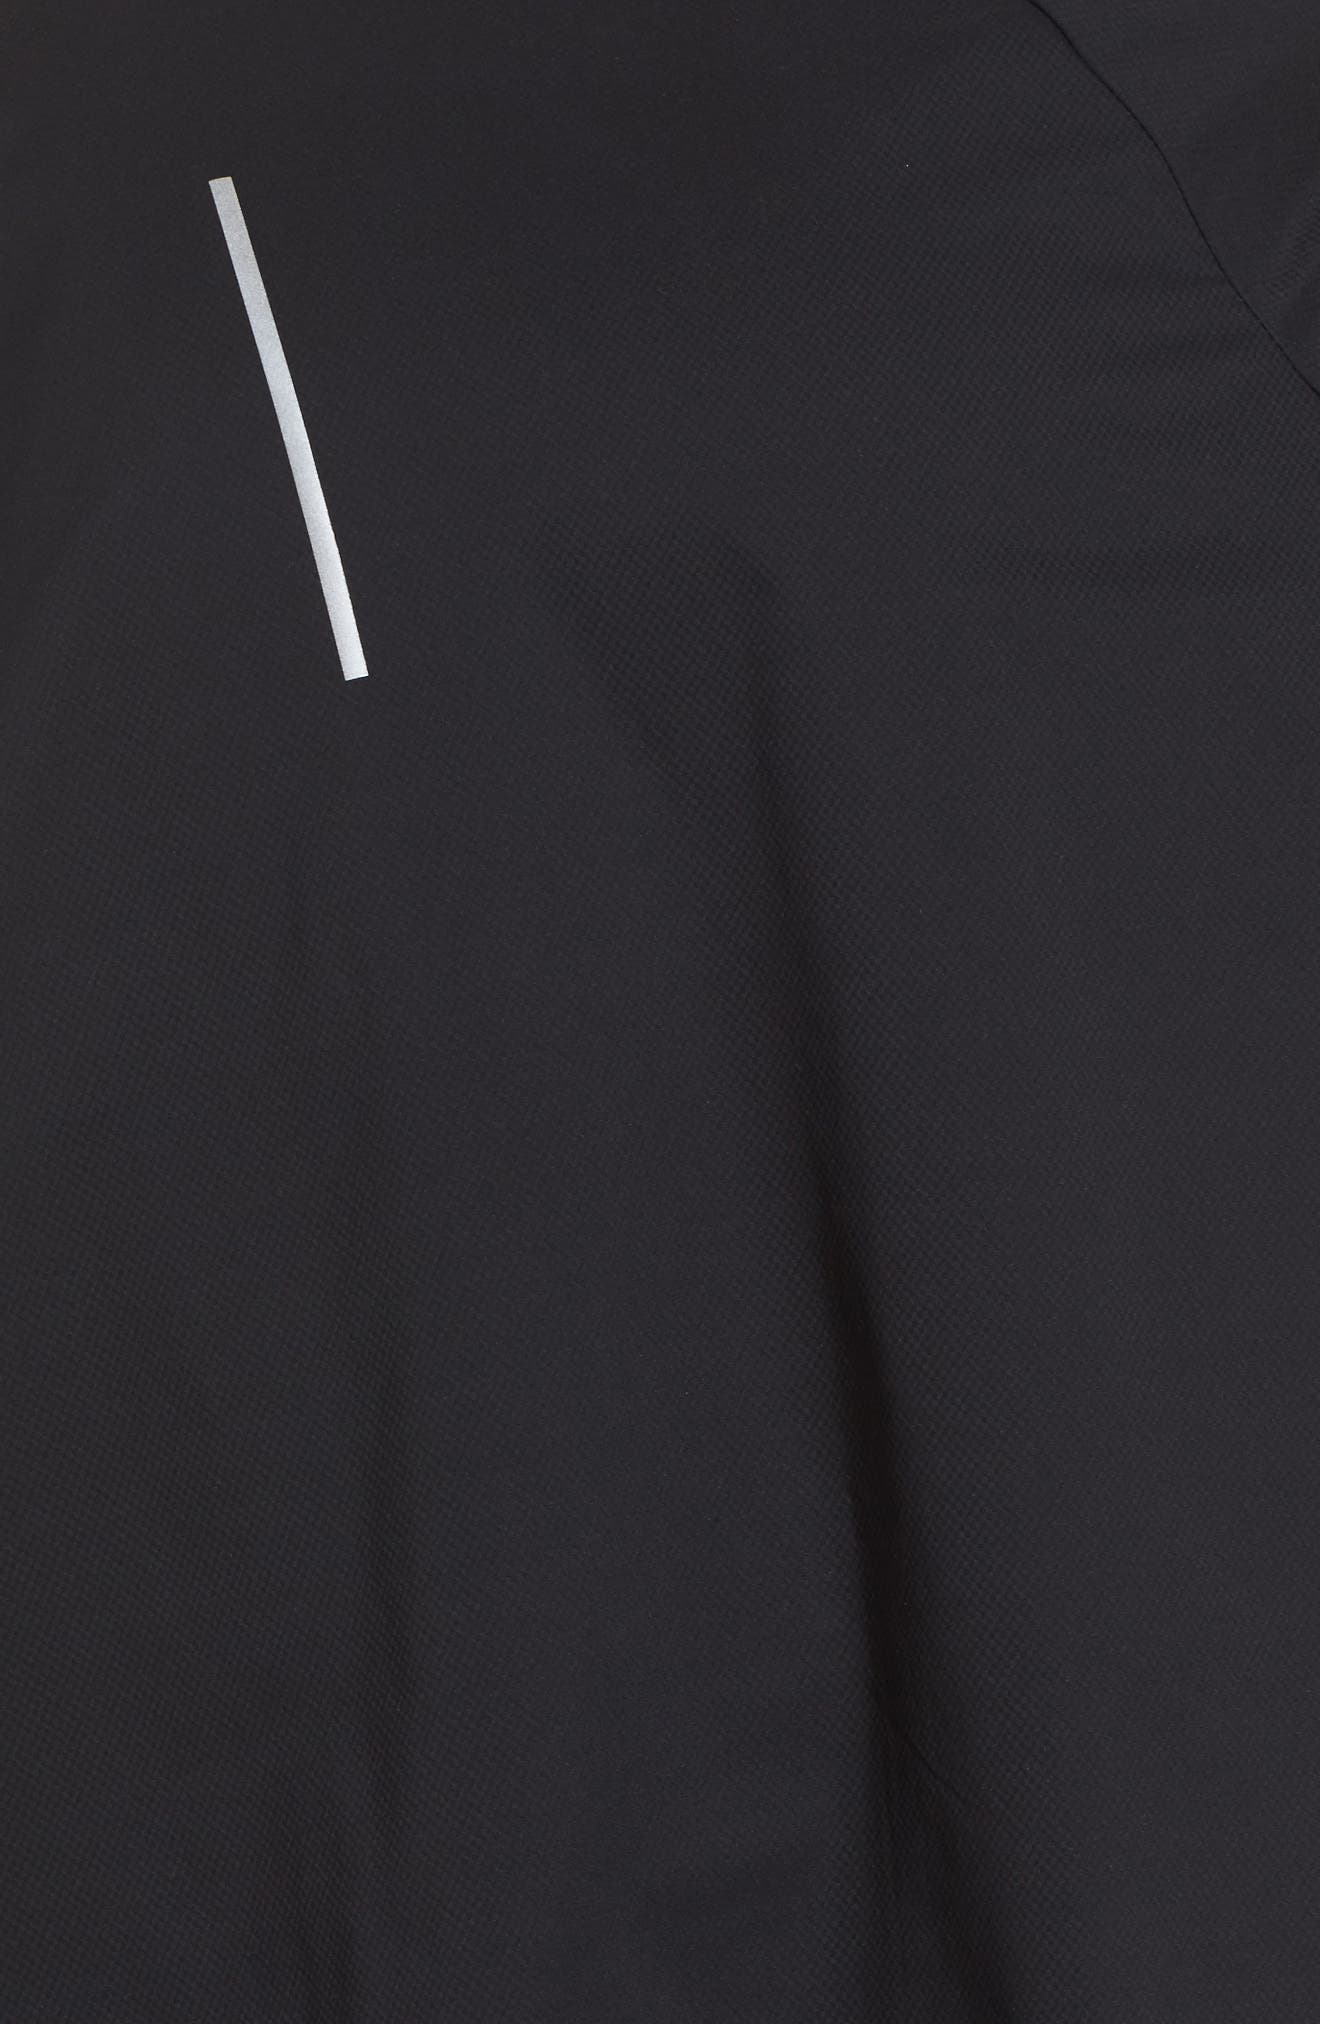 Flex Hooded Running Jacket,                             Alternate thumbnail 6, color,                             Black